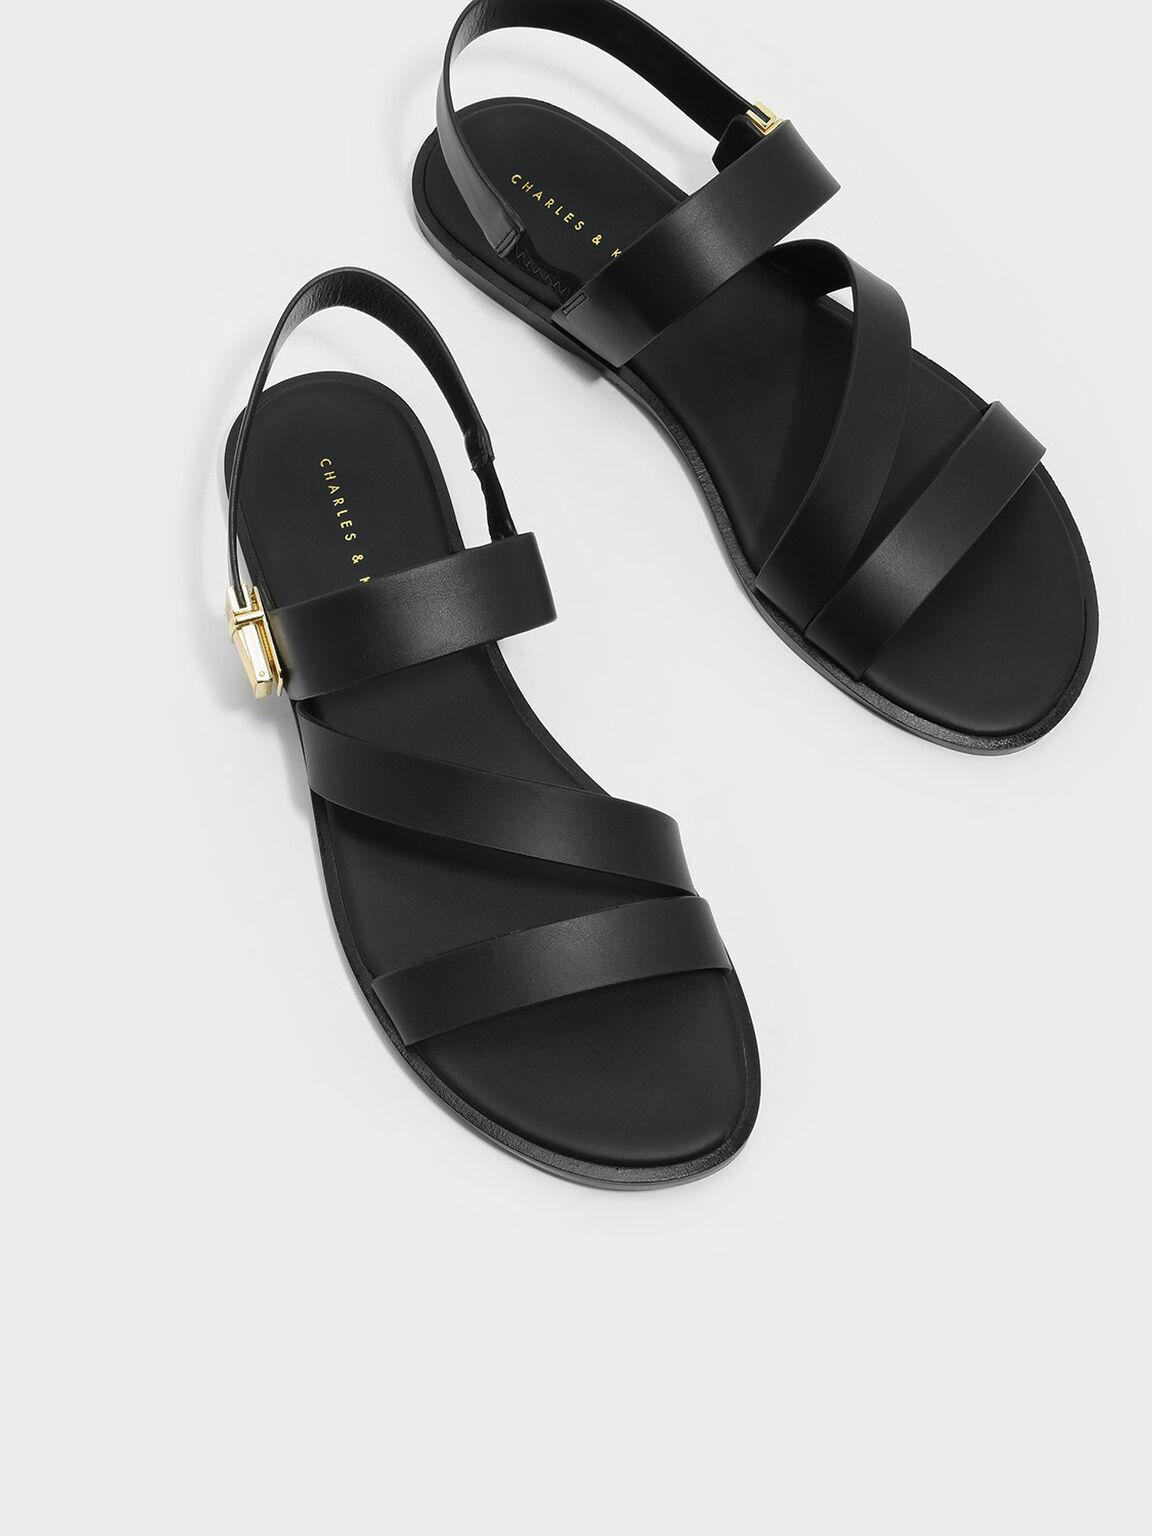 Strappy Open-Toe Sandals, Black, hi-res